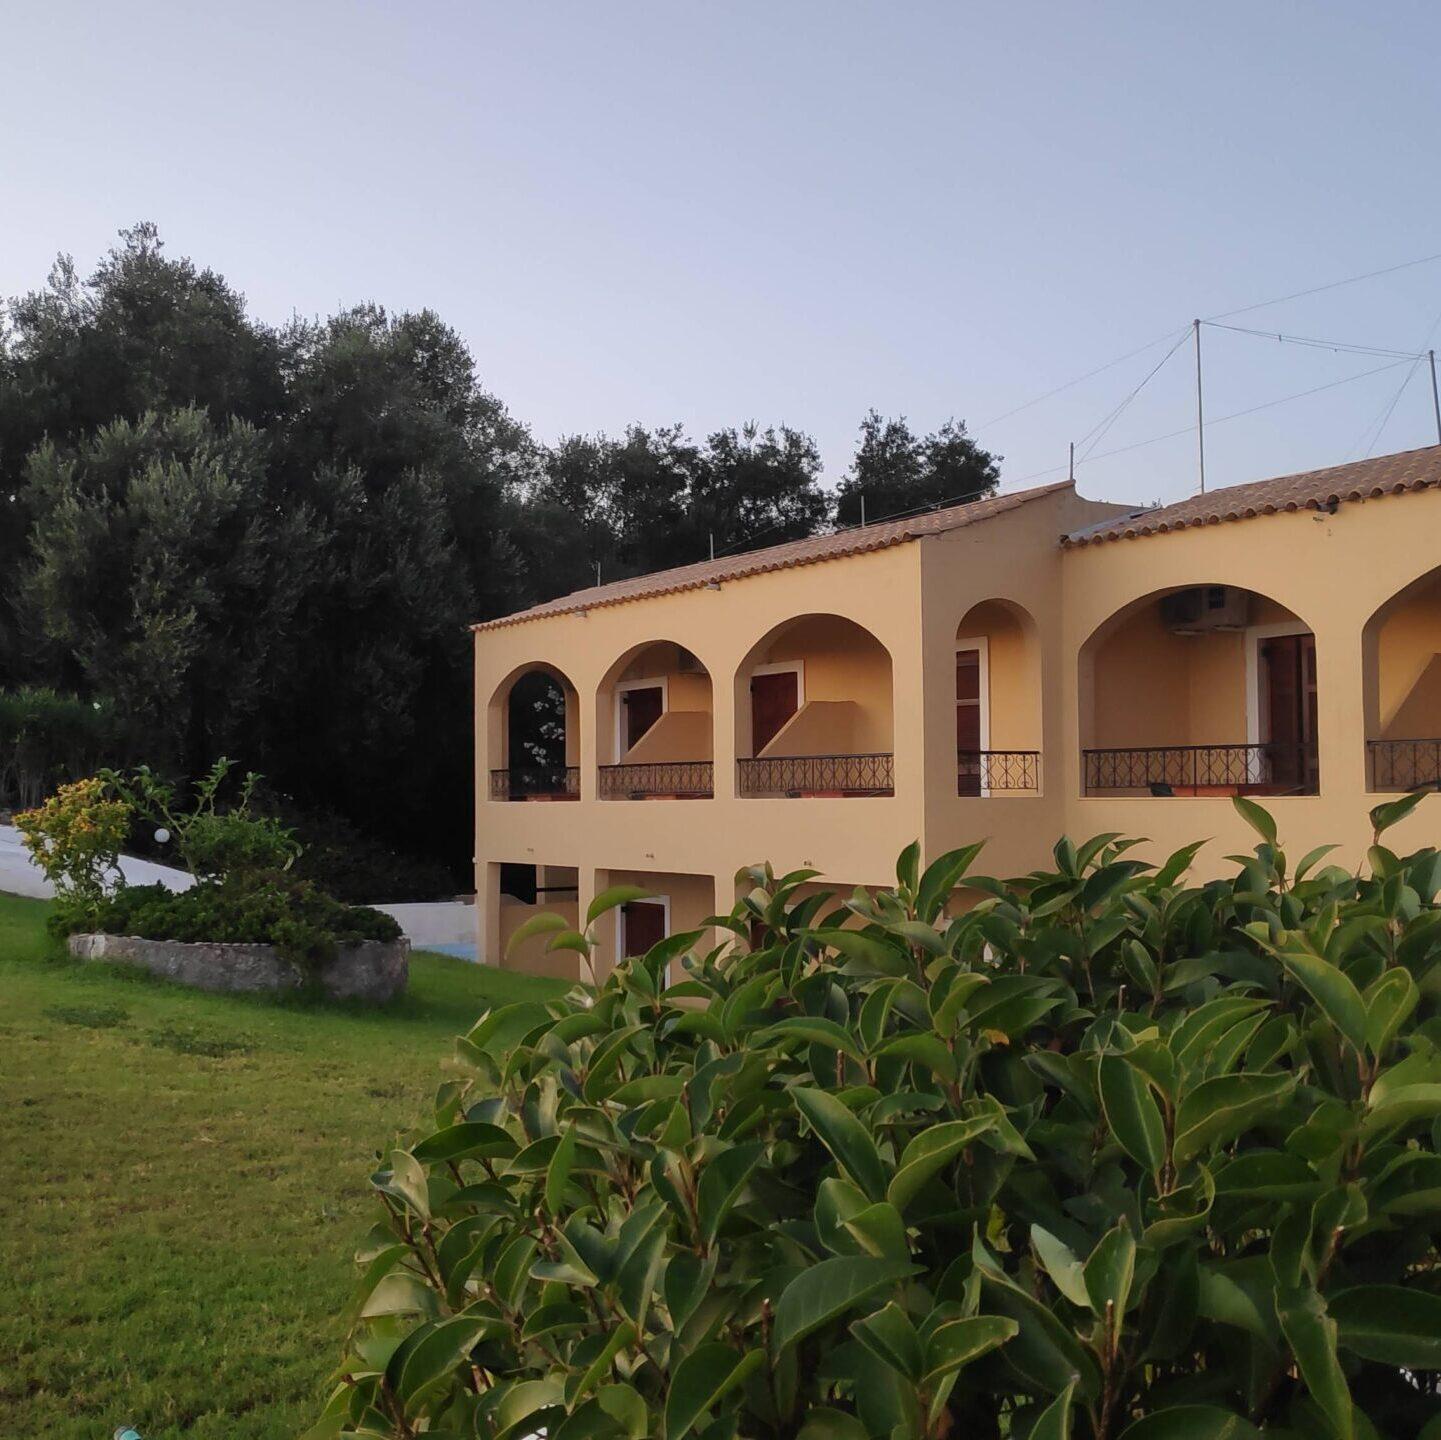 Agrilia Studios